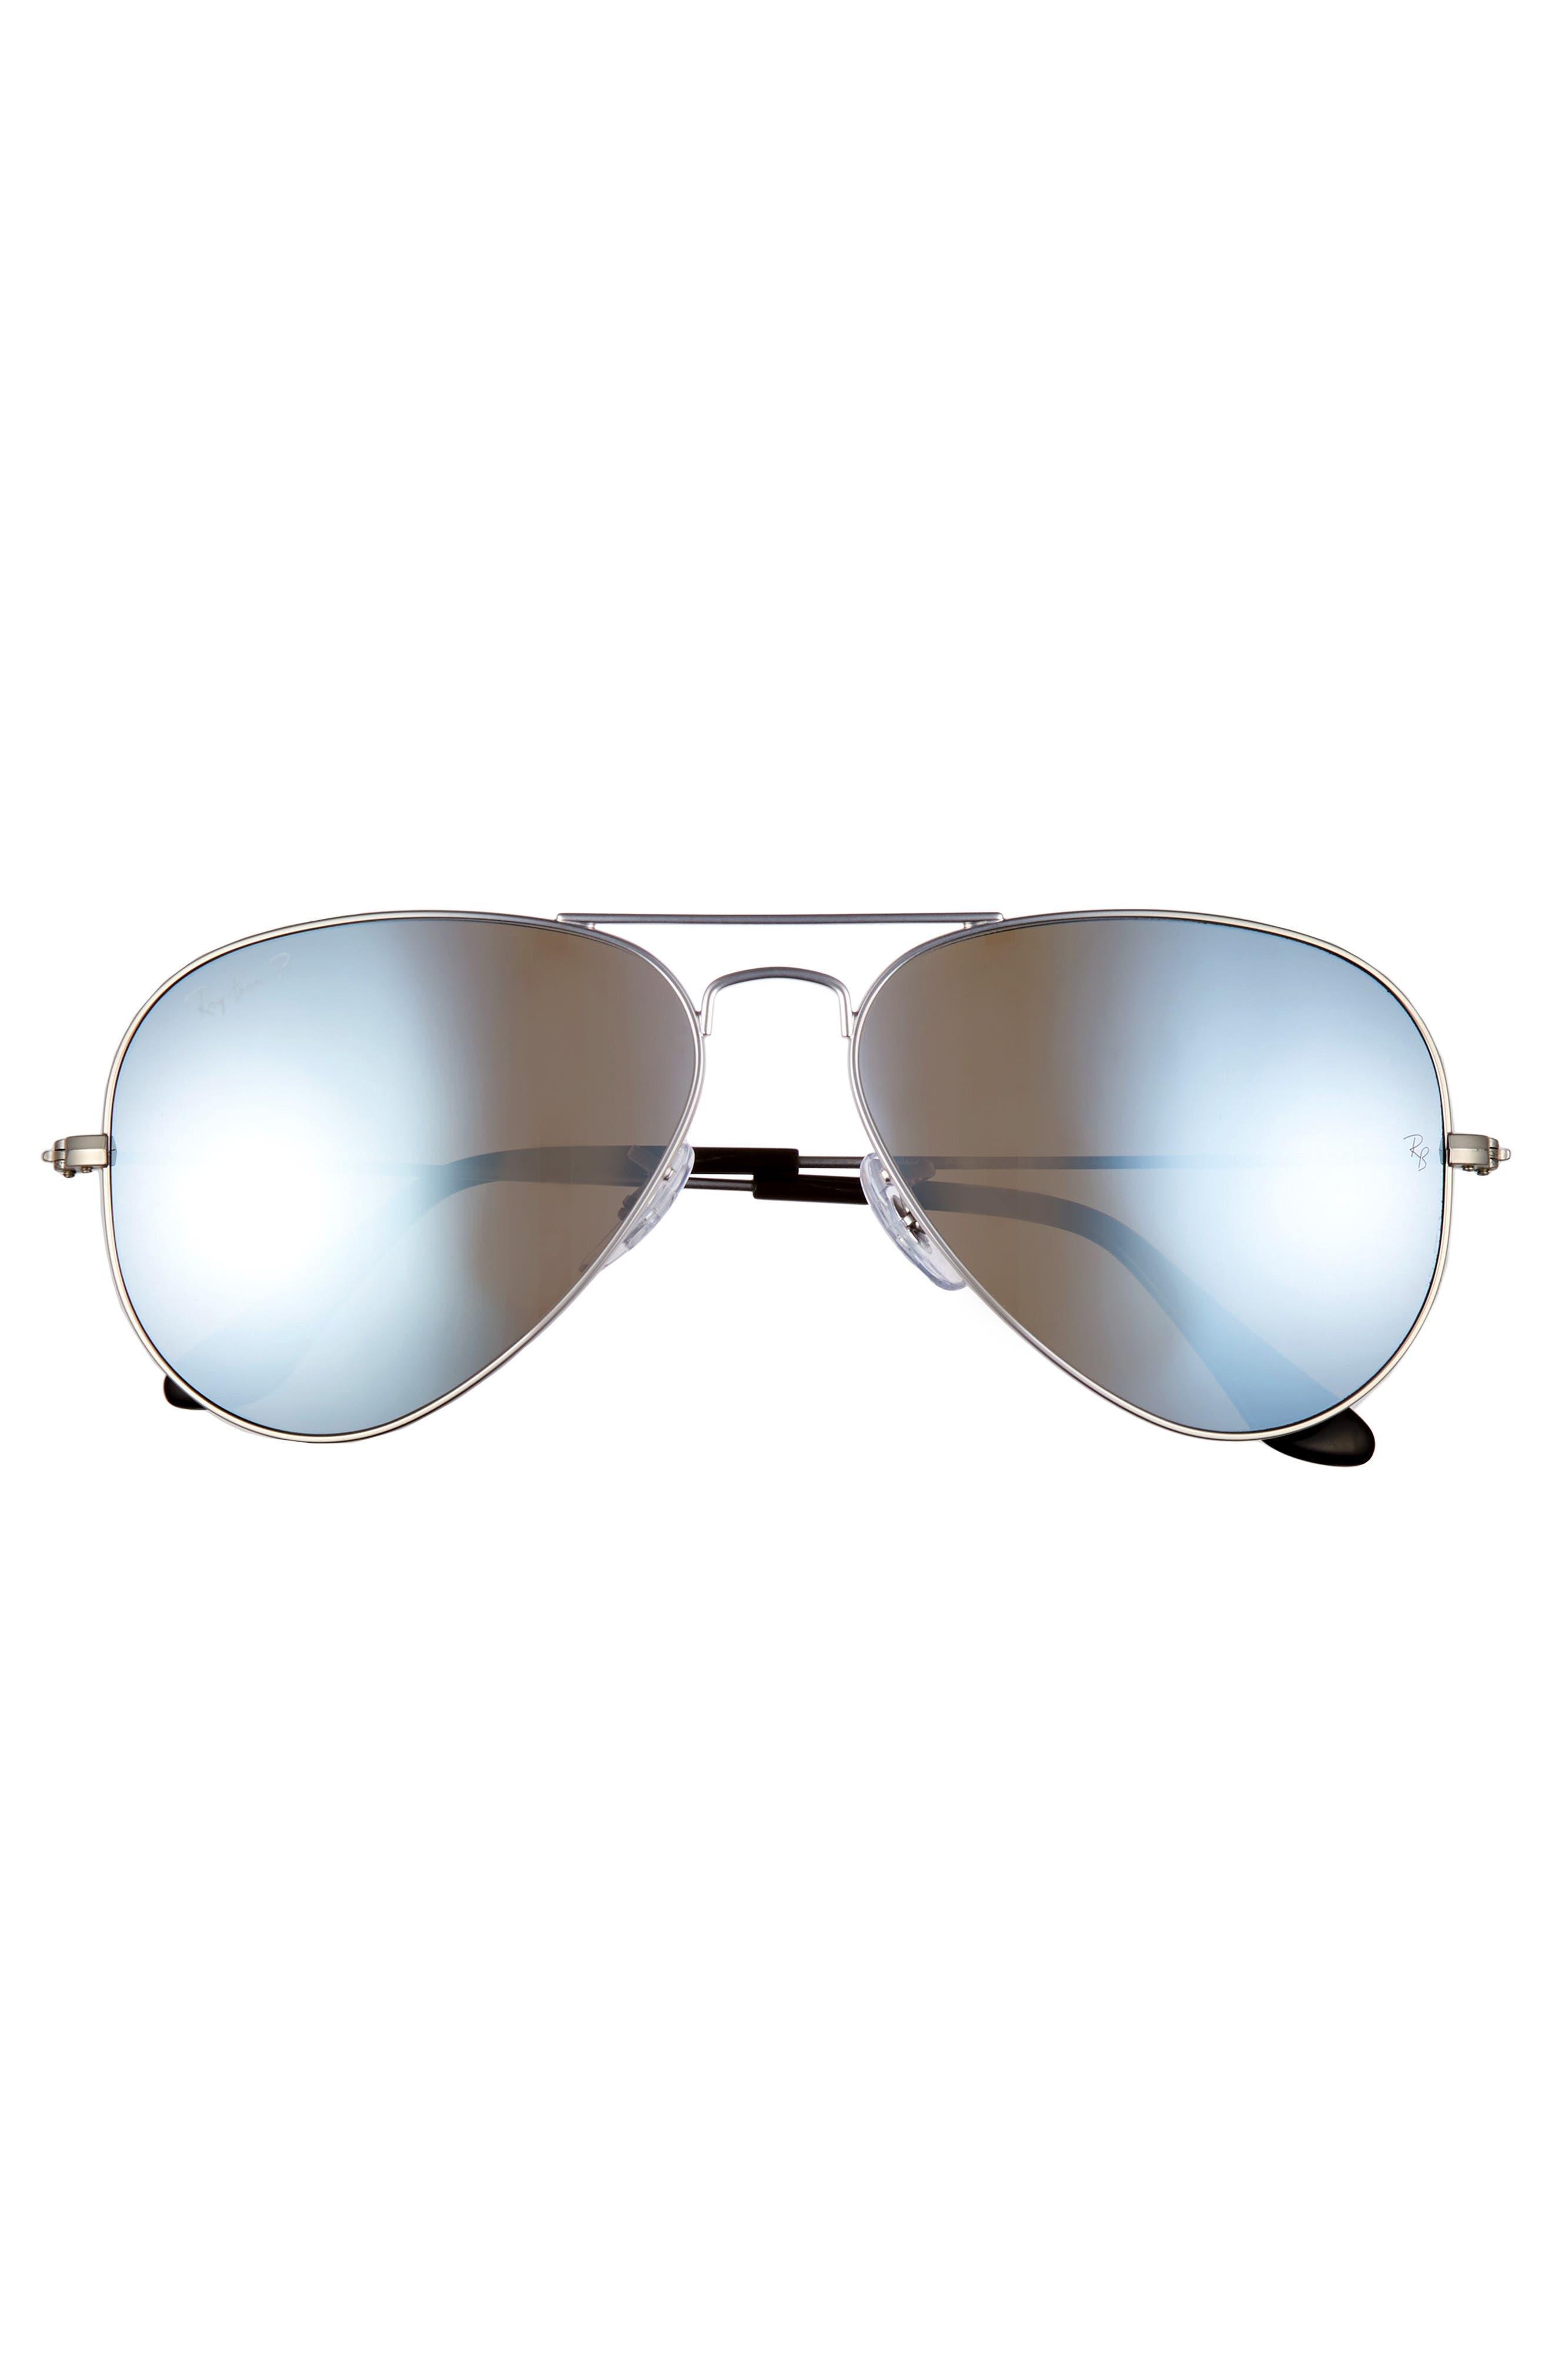 ,                             Standard Icons 58mm Mirrored Polarized Aviator Sunglasses,                             Alternate thumbnail 3, color,                             SILVER/ SILVER MIRROR